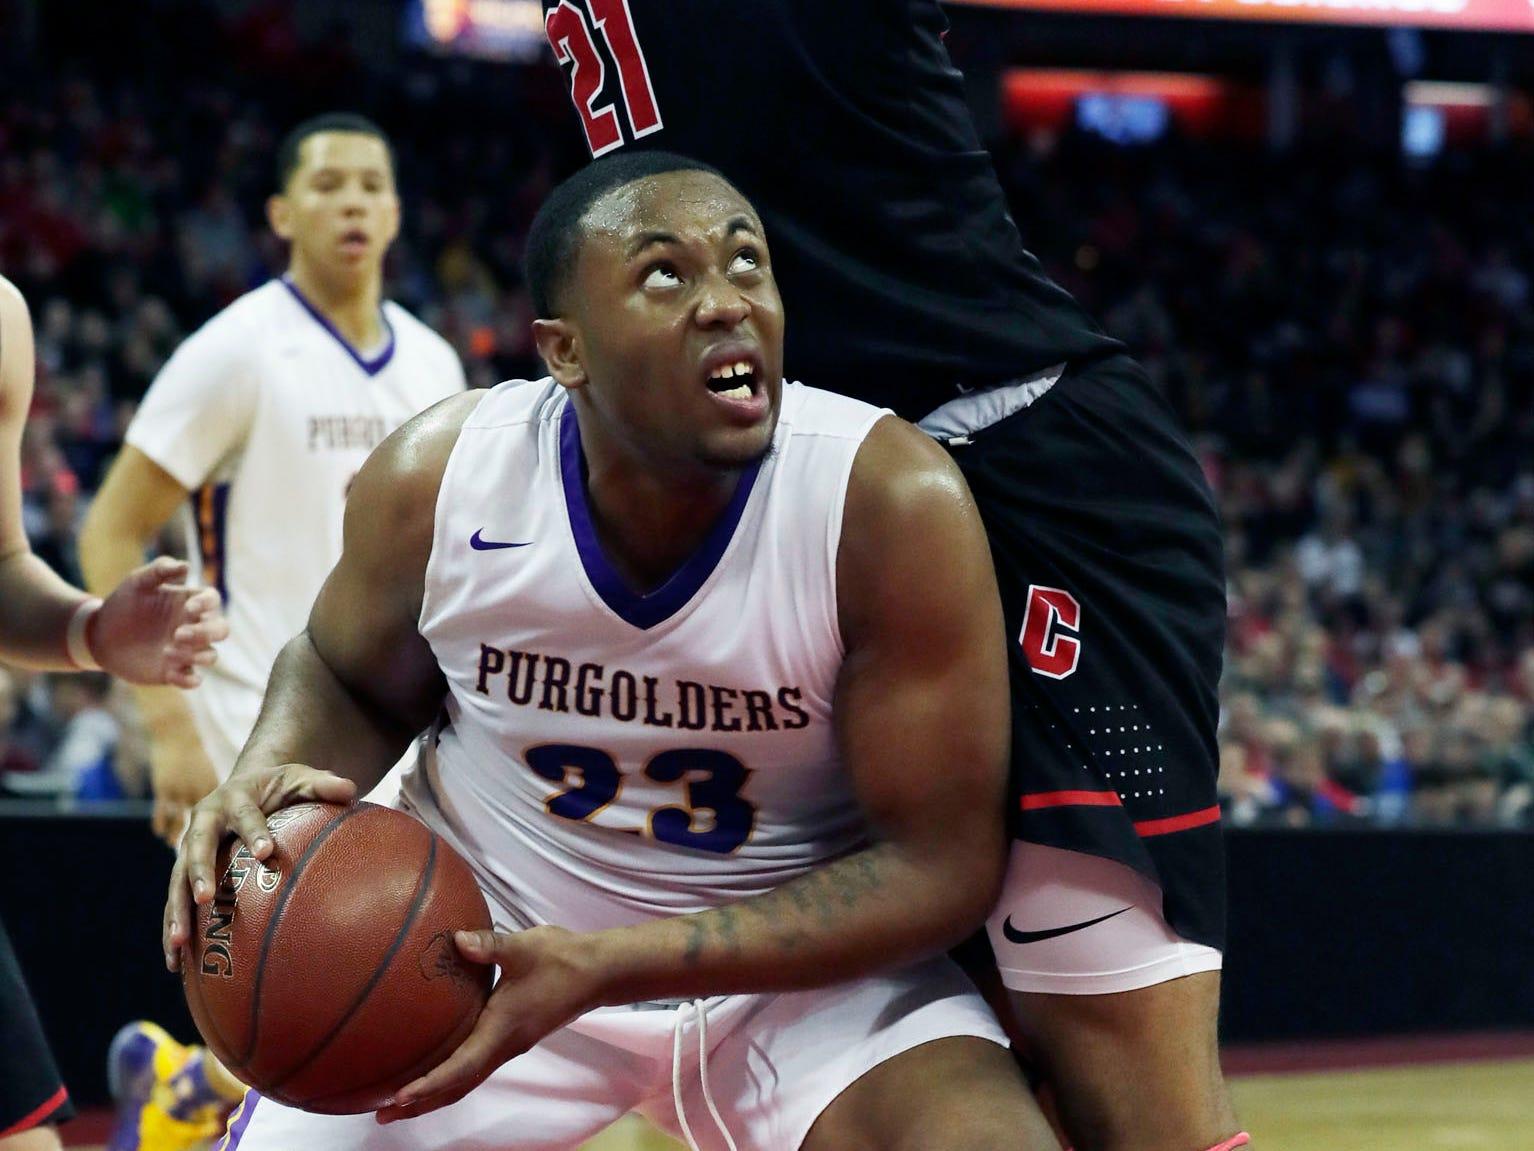 Milwaukee Washington's Johntae Martin tries to find space under the basket,